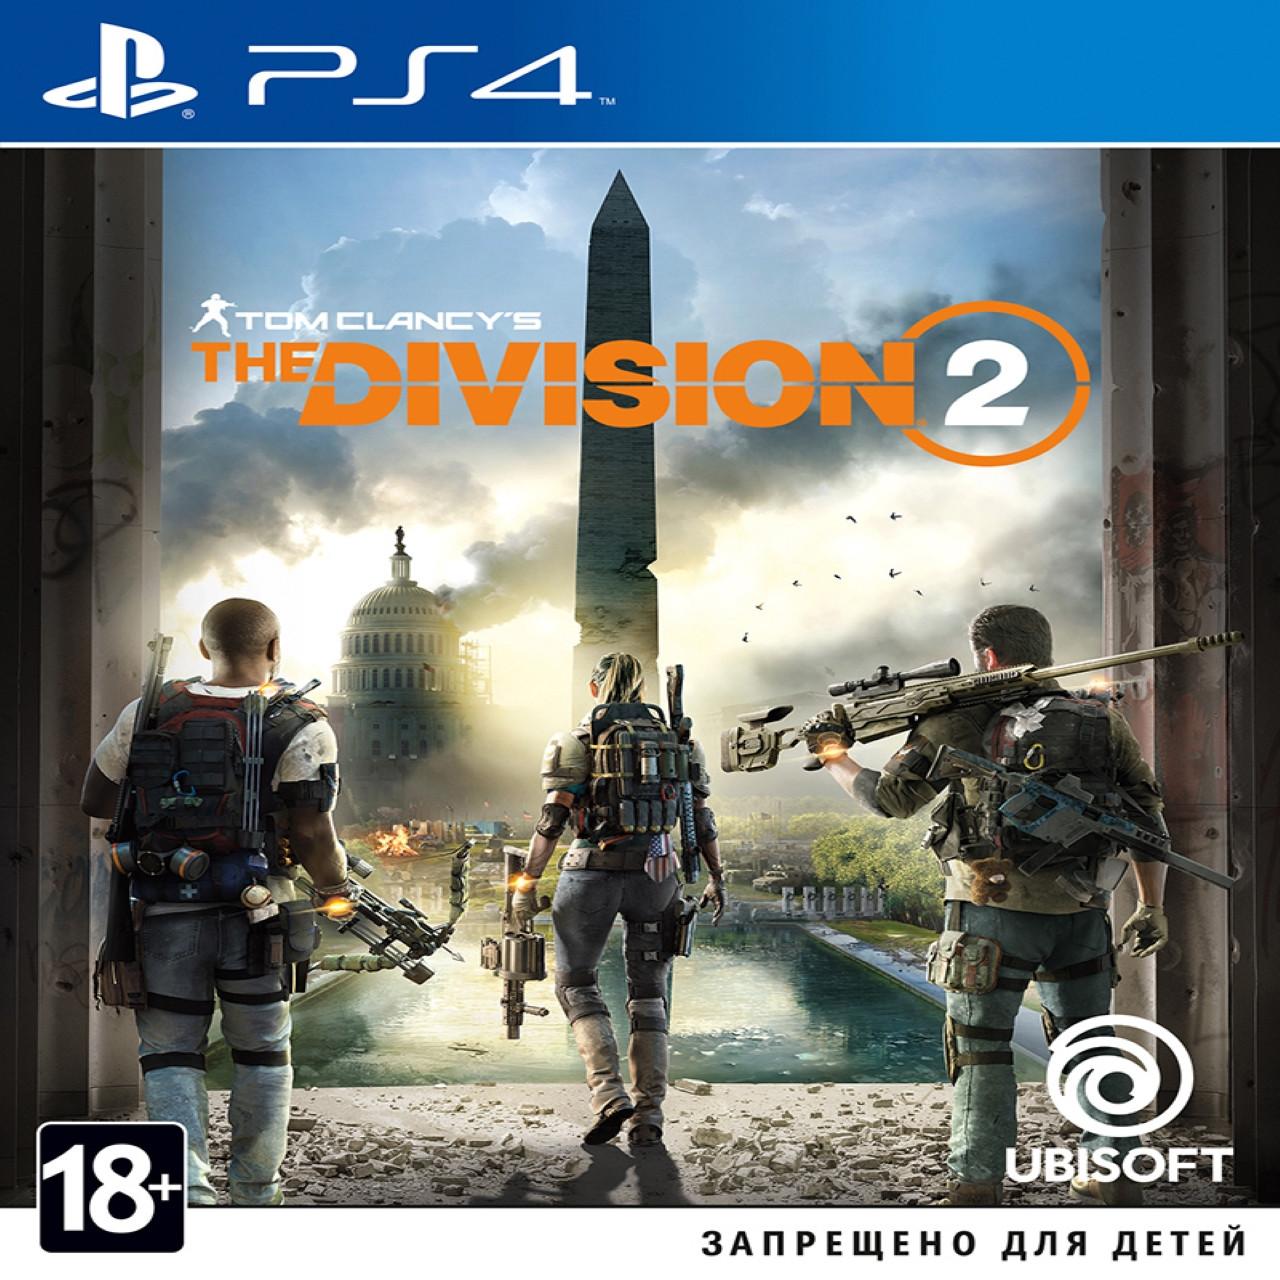 Tom Clancy's The Division 2 (російська версія) PS4